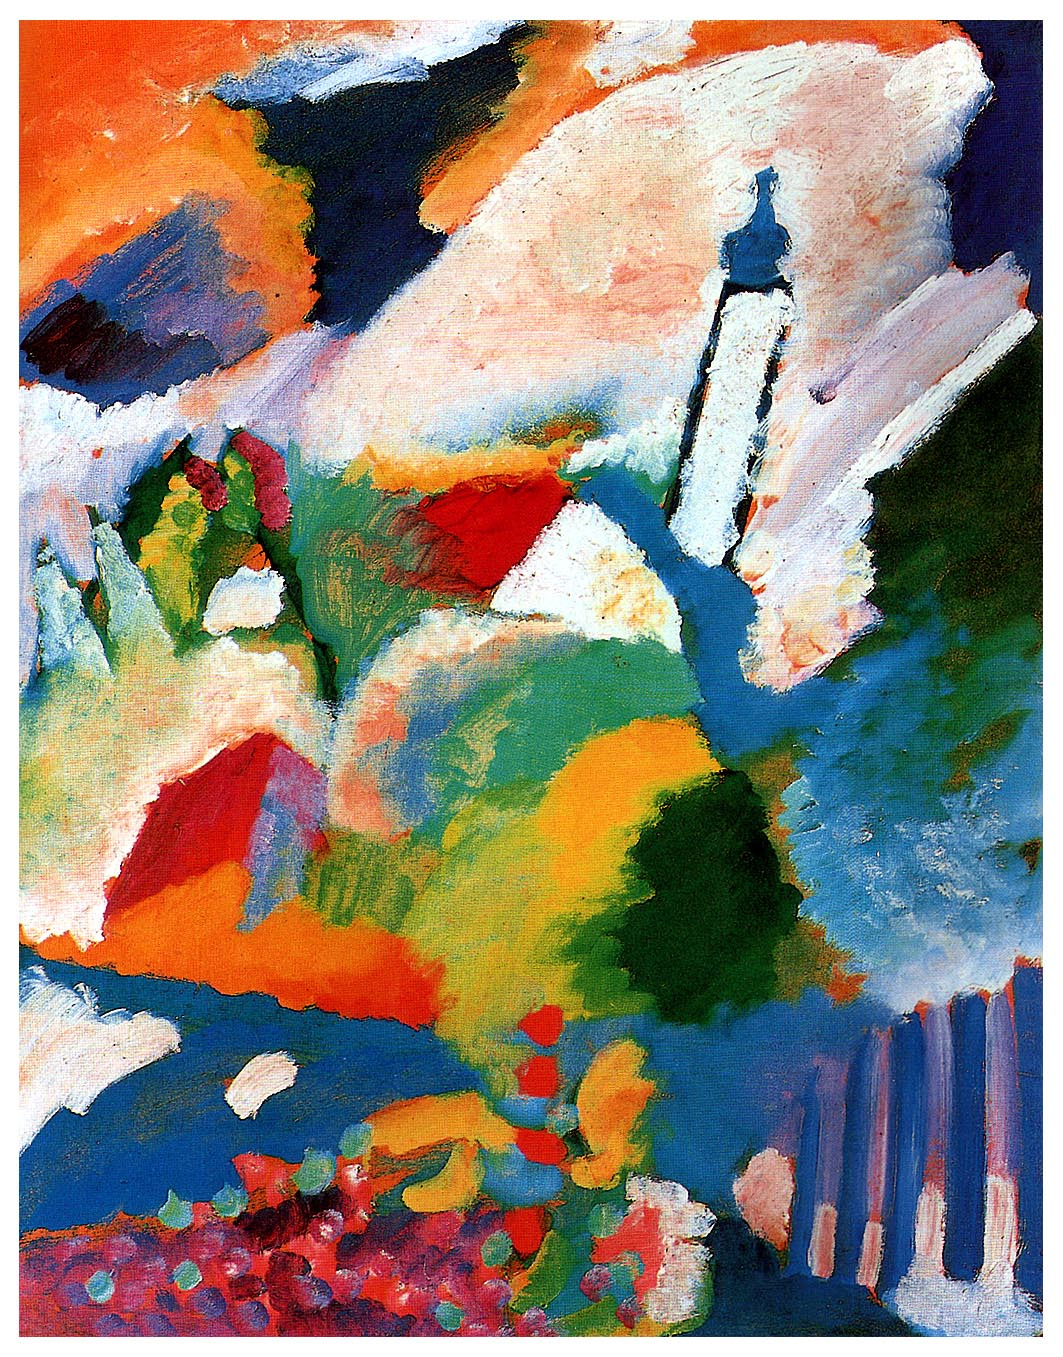 Wassily Kandinsky. The Church in Murnau